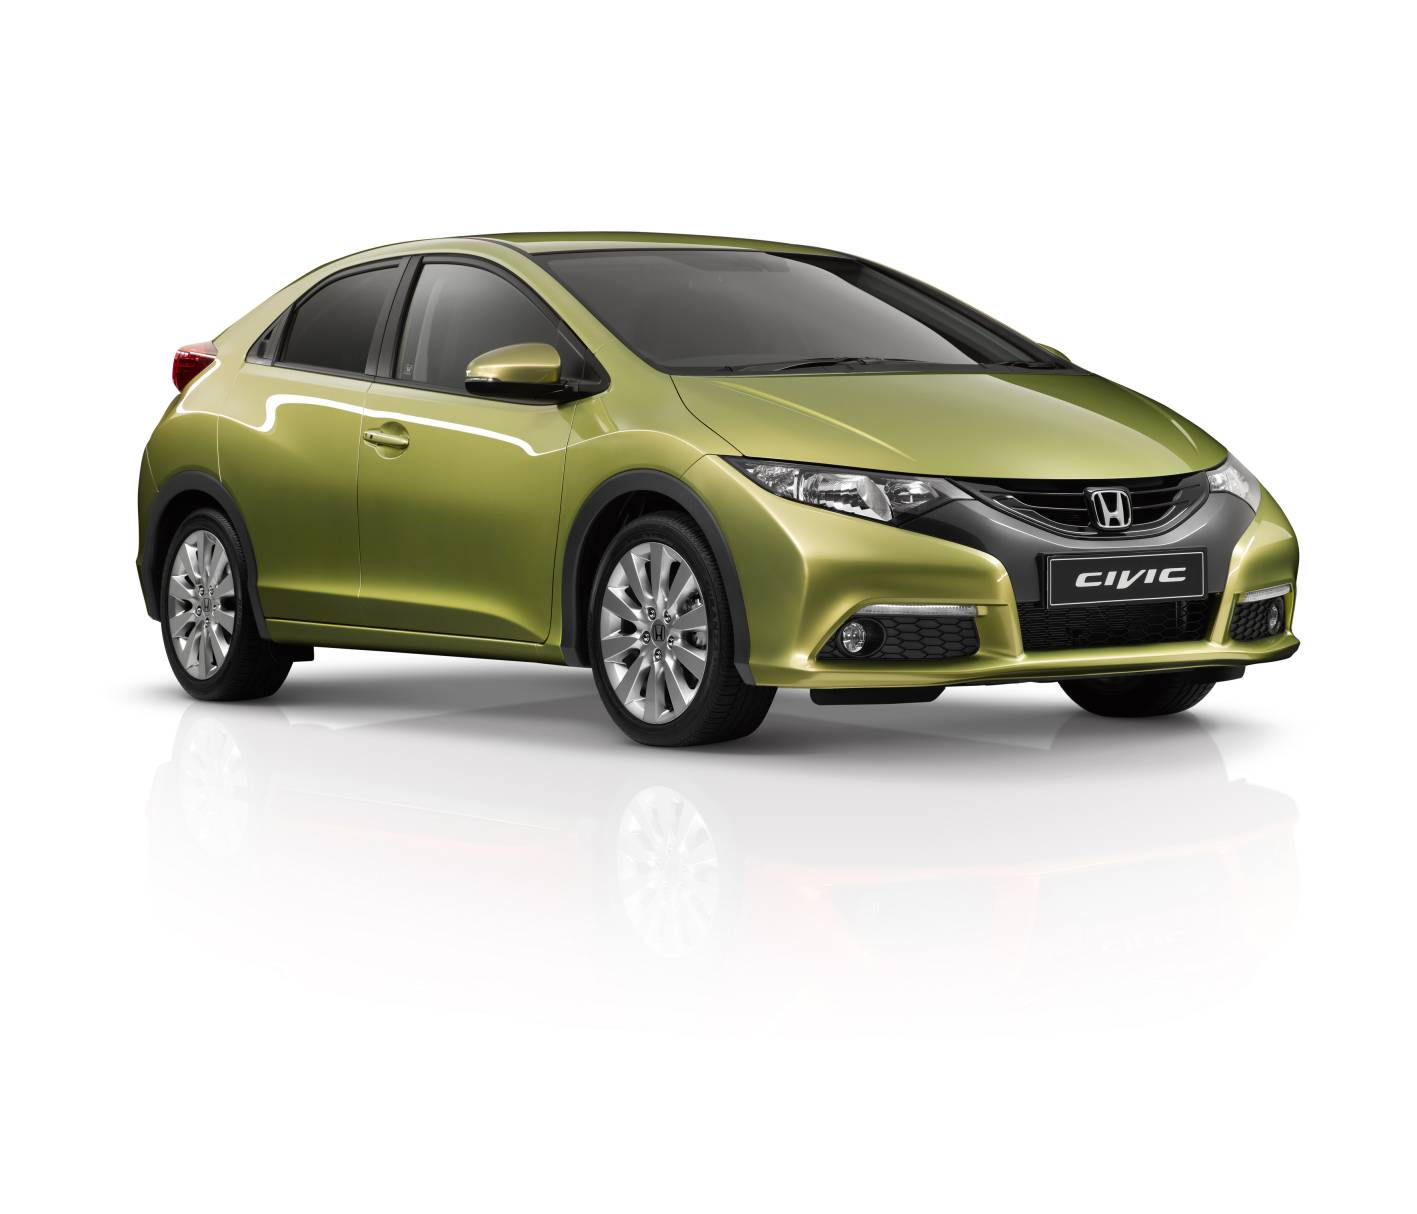 Preview New Honda Civic 2019 Launch Today: 2013 Honda Civic Hatchback Updates